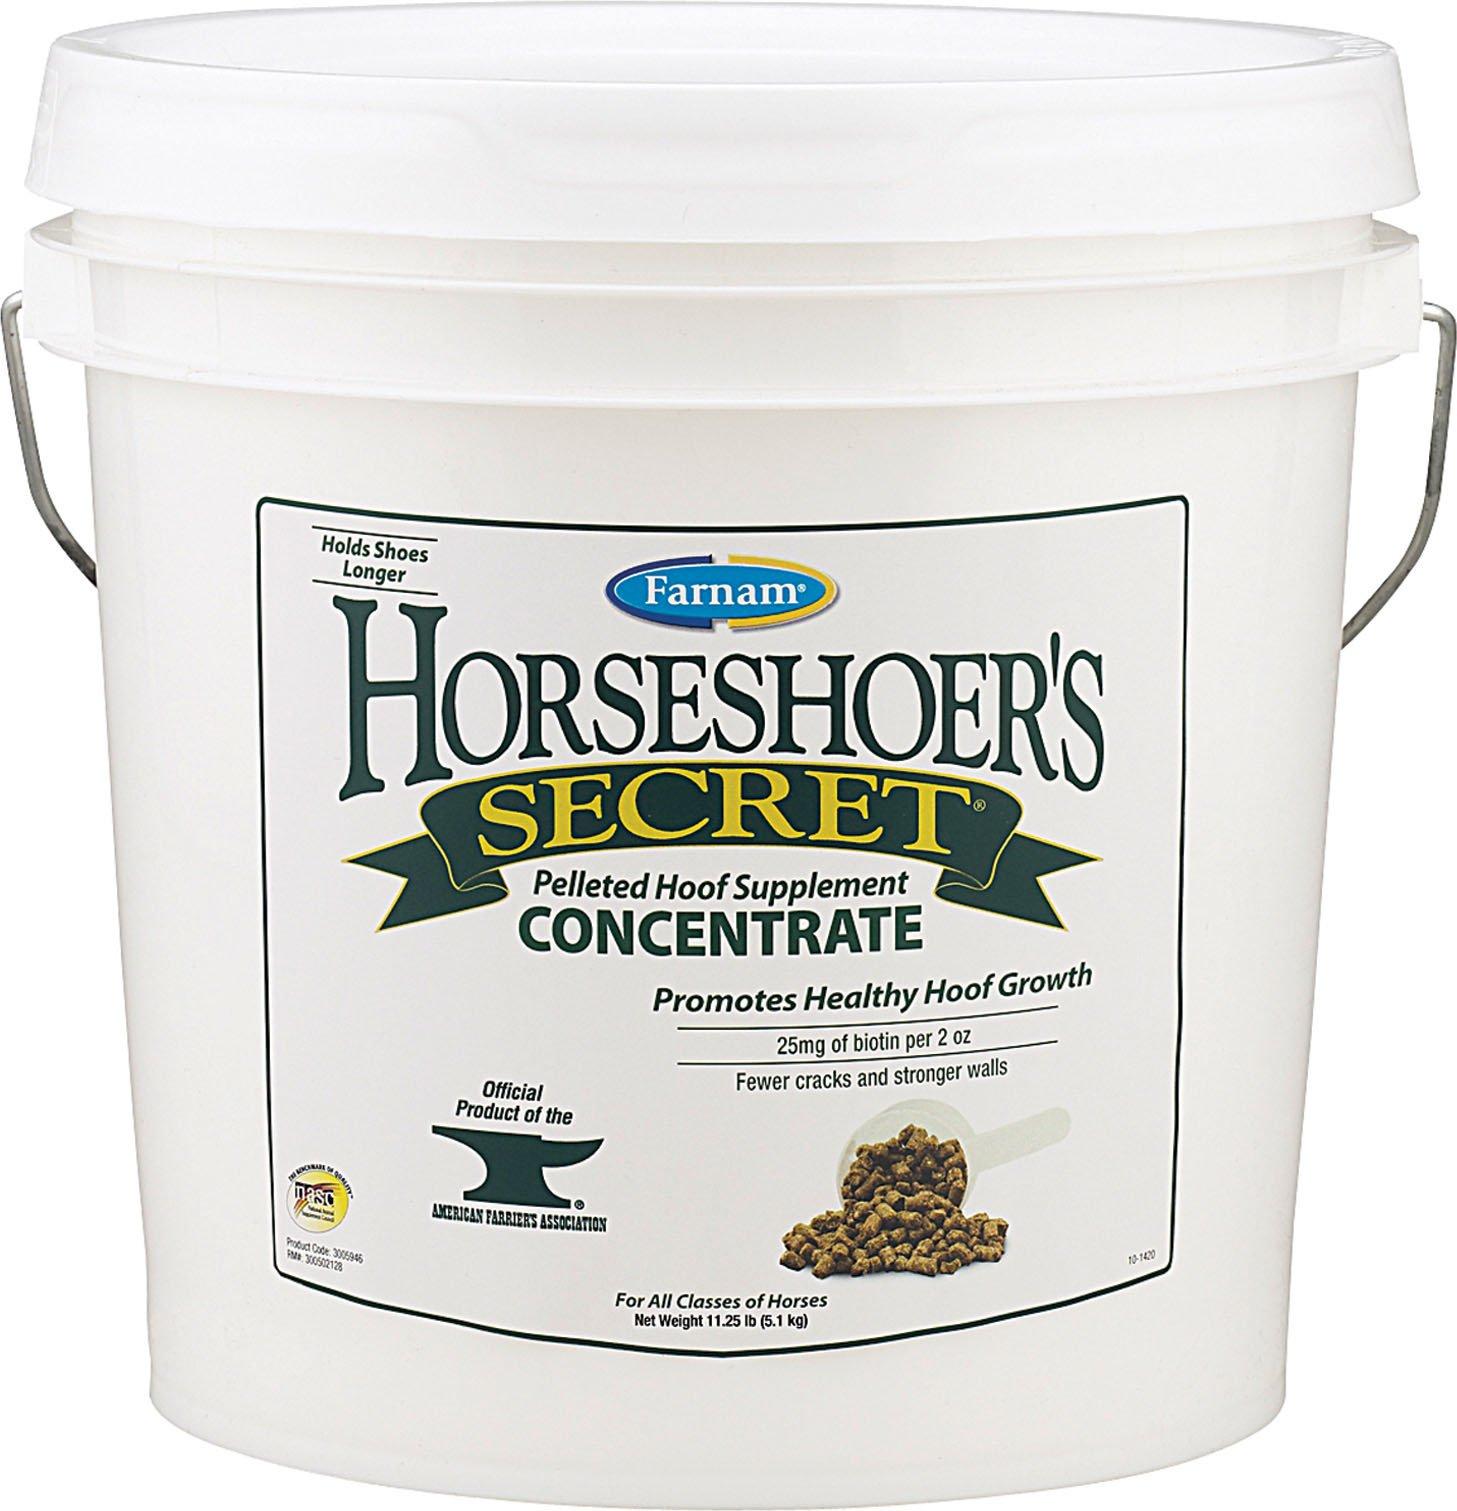 Farnam Horseshoer's Secret Hoof Supplement Concentrate, 11 Pound